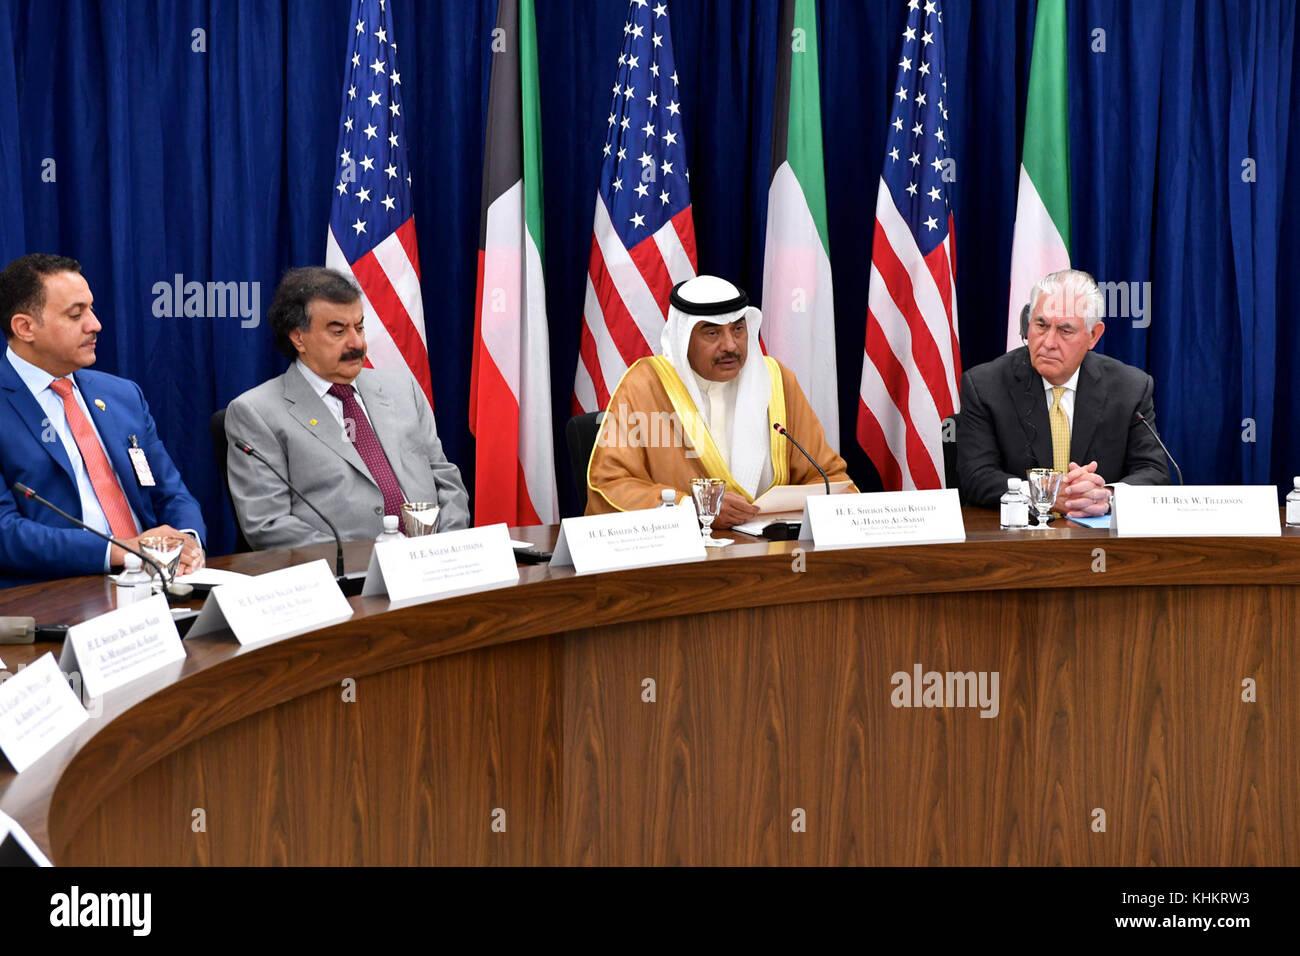 U.S. Secretary of State Rex Tillerson listens on as Kuwaiti Foreign Minister Sheikh Sabah Al-Khaled Al-Hamad Al - Stock Image